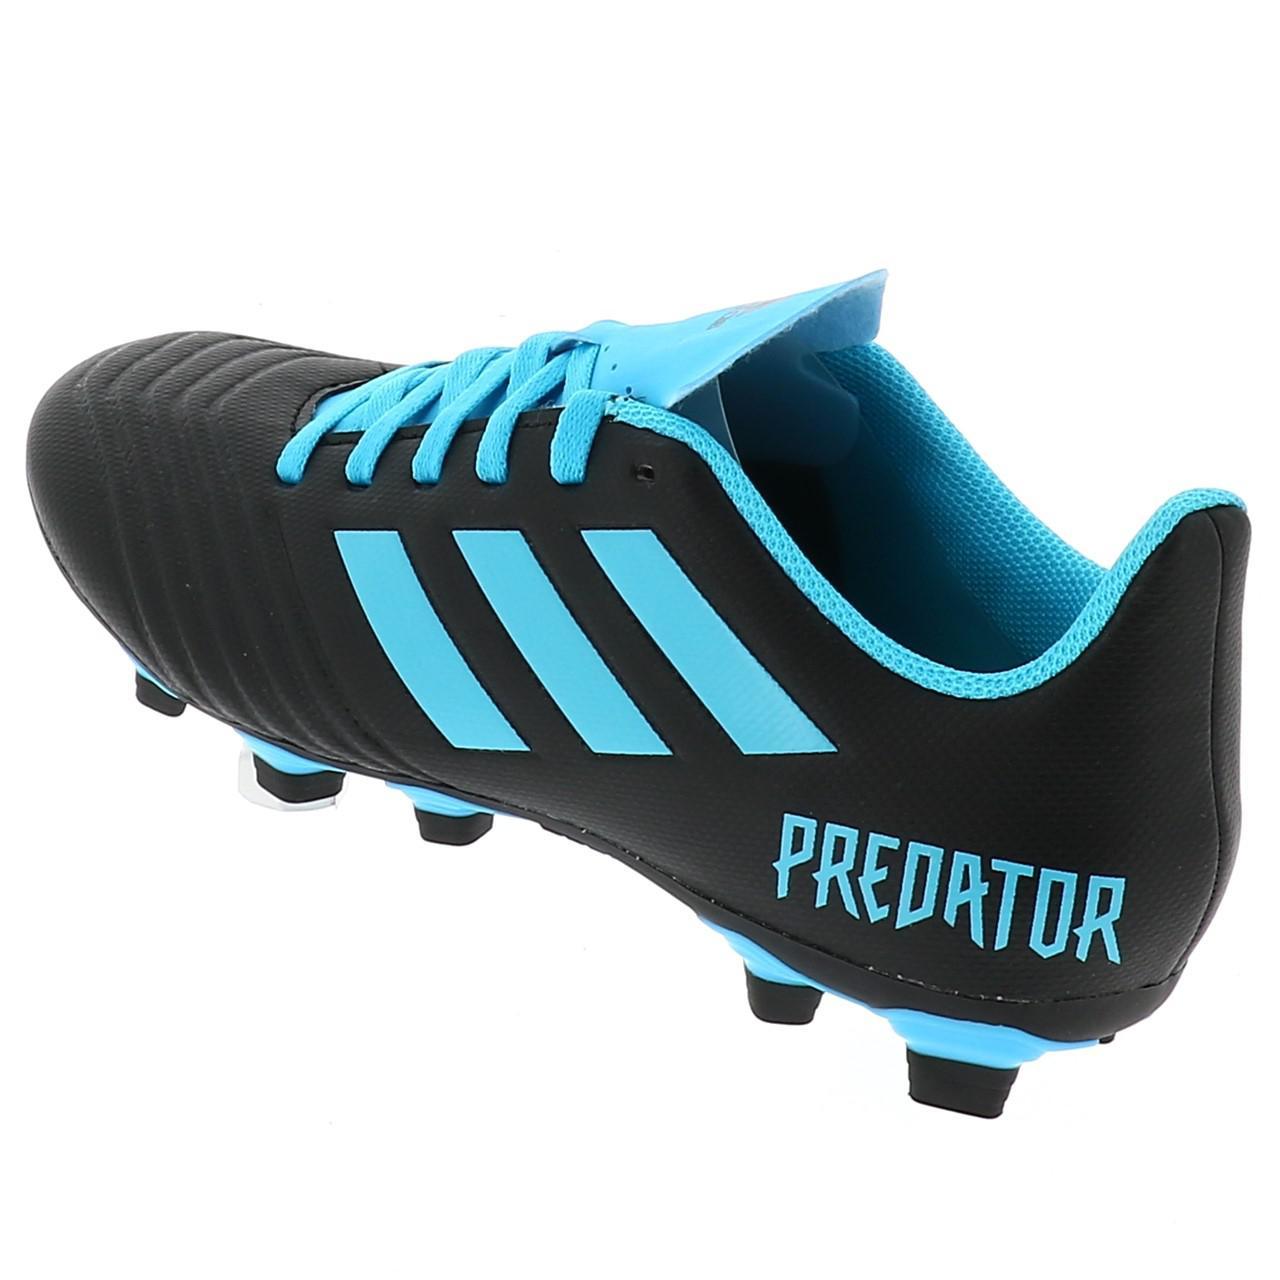 Chaussures-football-lamelles-Adidas-Predator-19-4-fg-grorg-Noir-42821-Neuf miniature 3